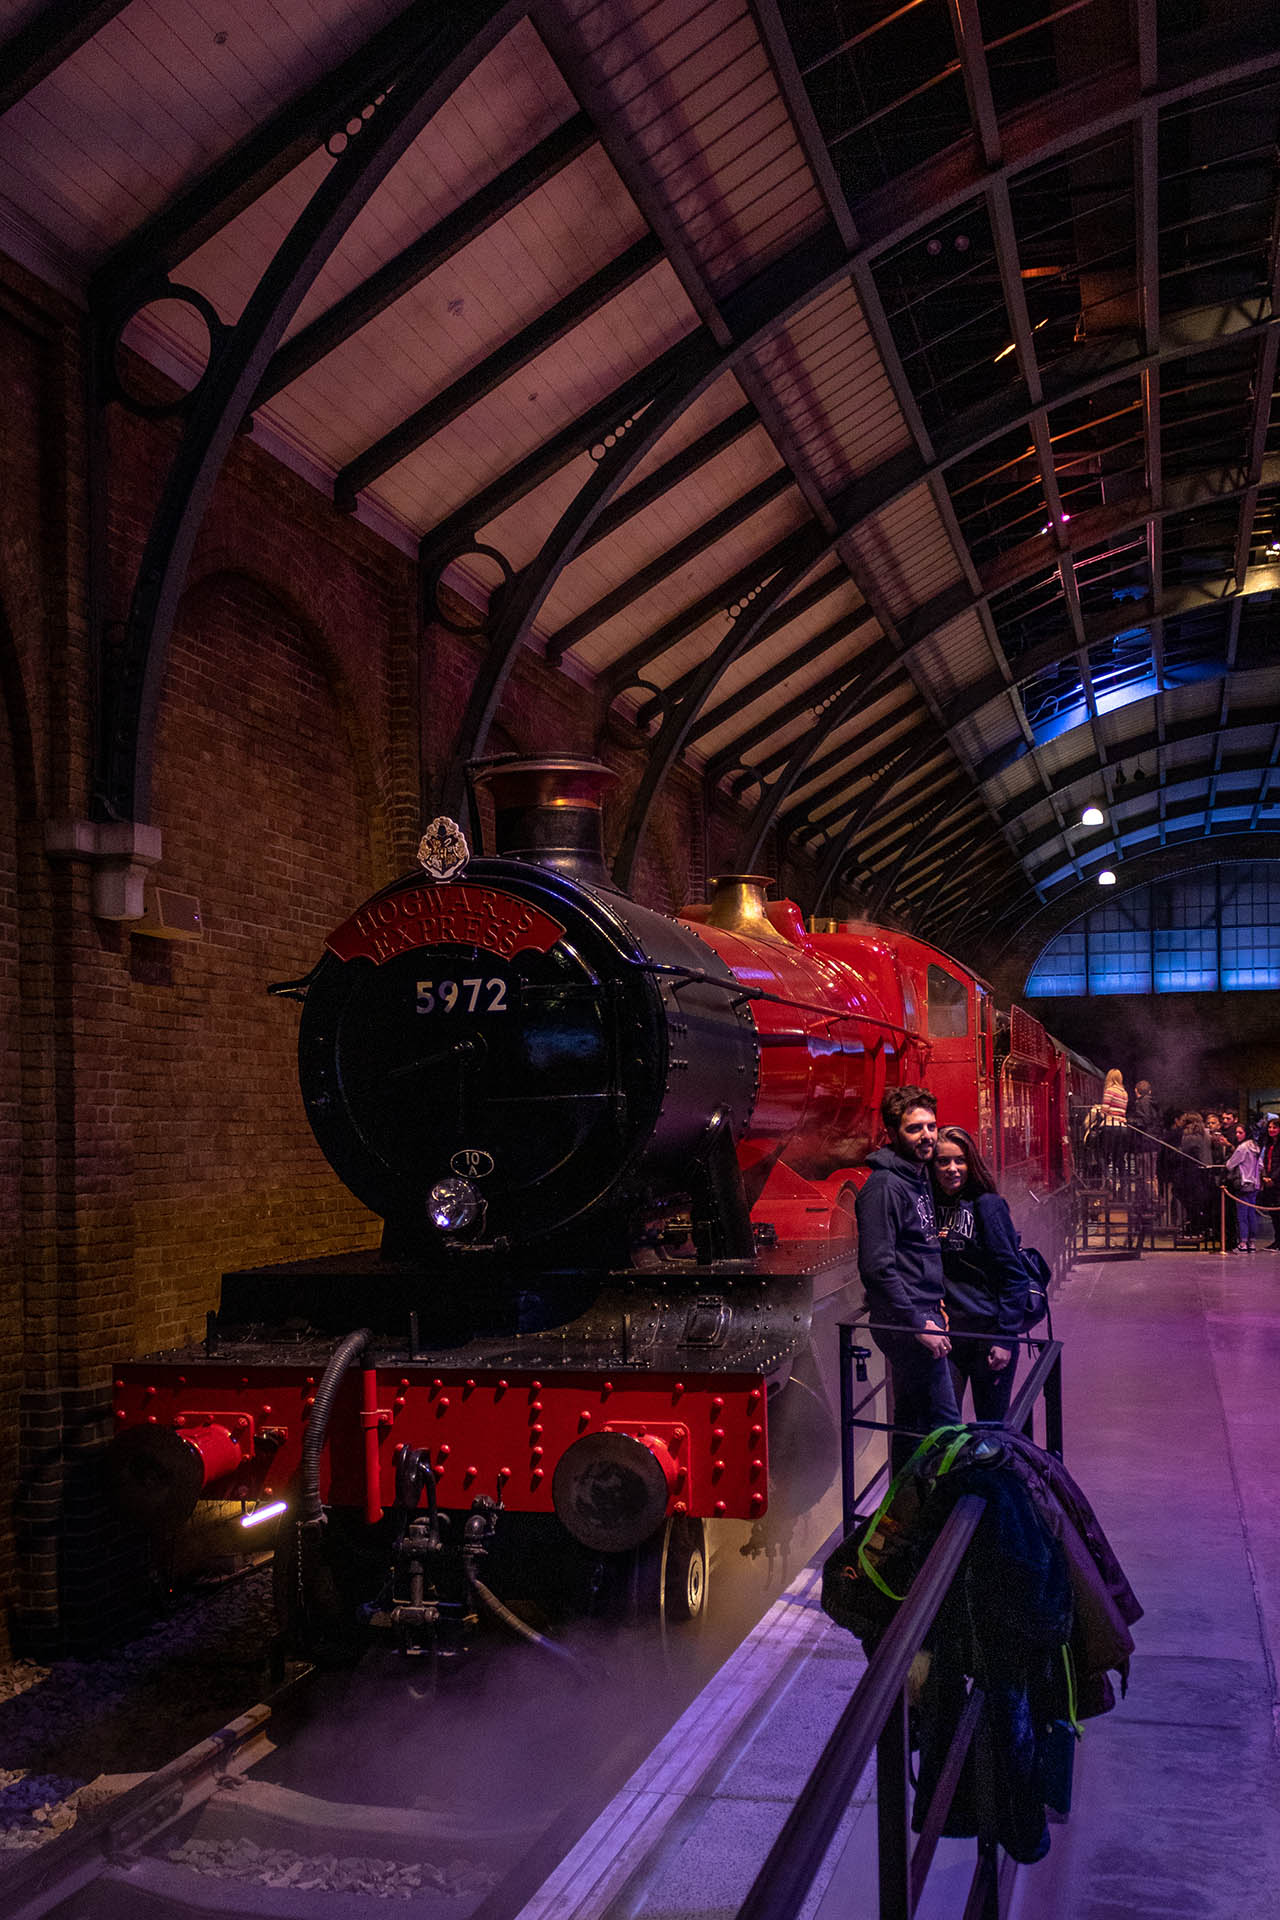 De Hogwarts Express op Platform 9 3/4 in de Studio Tour